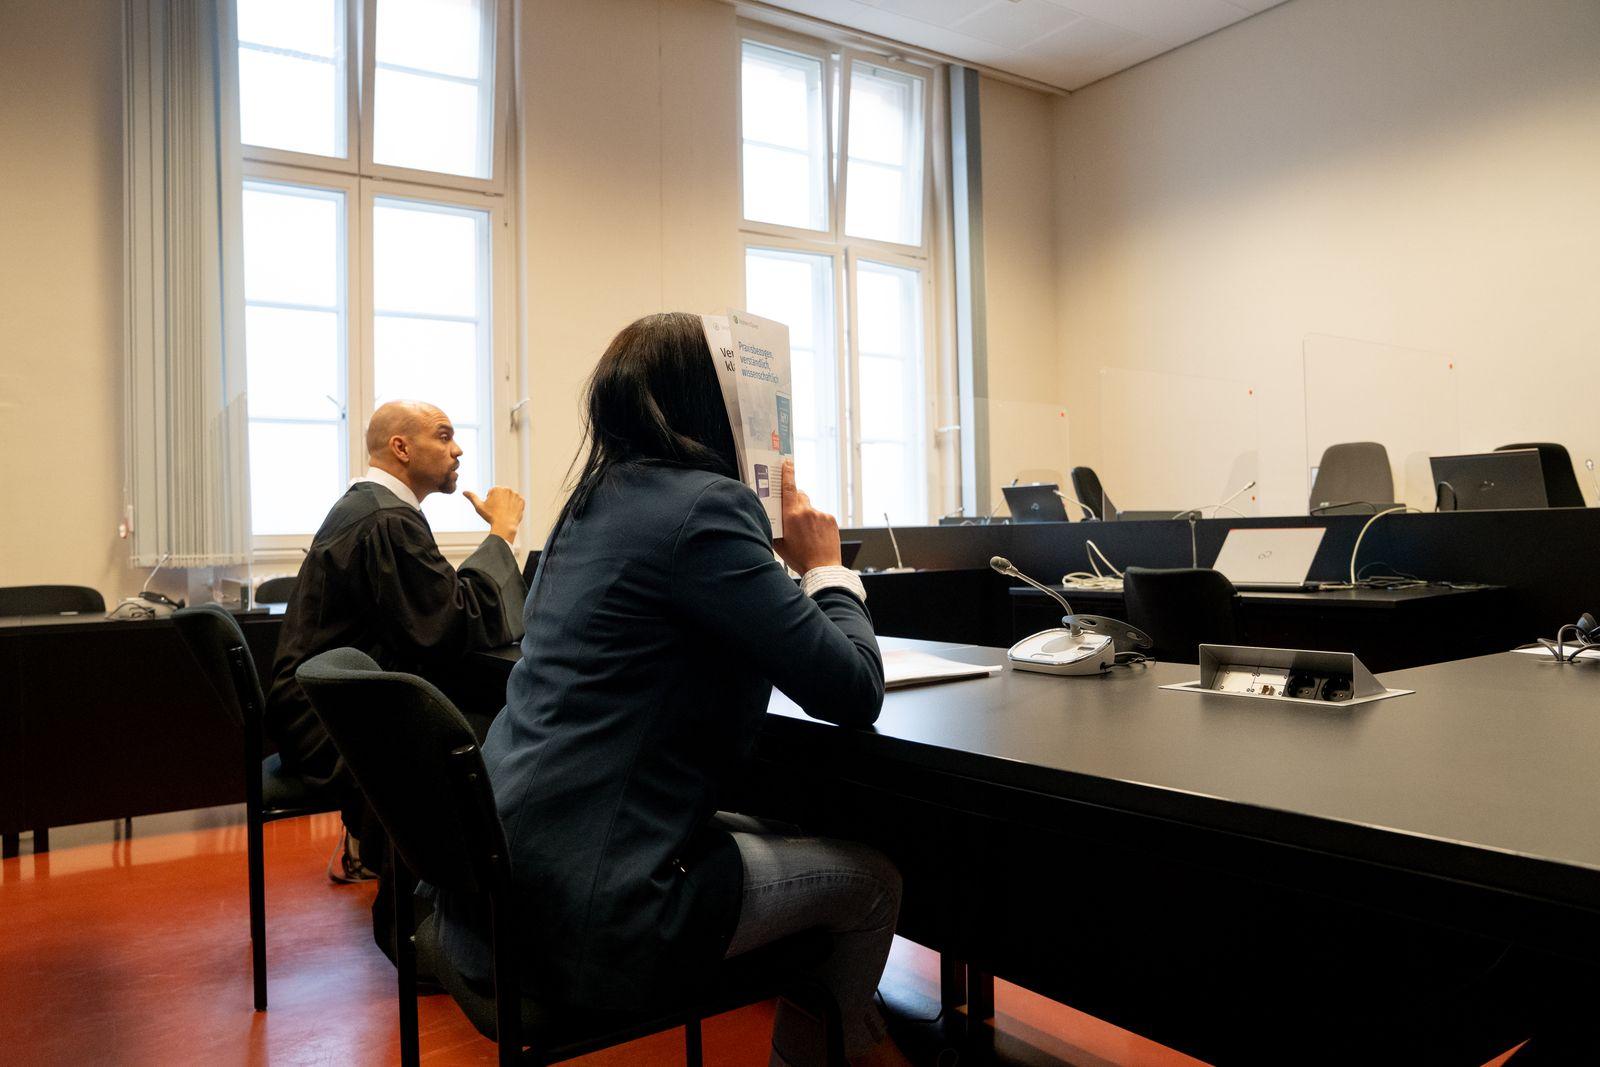 Trial Of Denis Cuspert Widow And Islamic State Member Begins In Hamburg